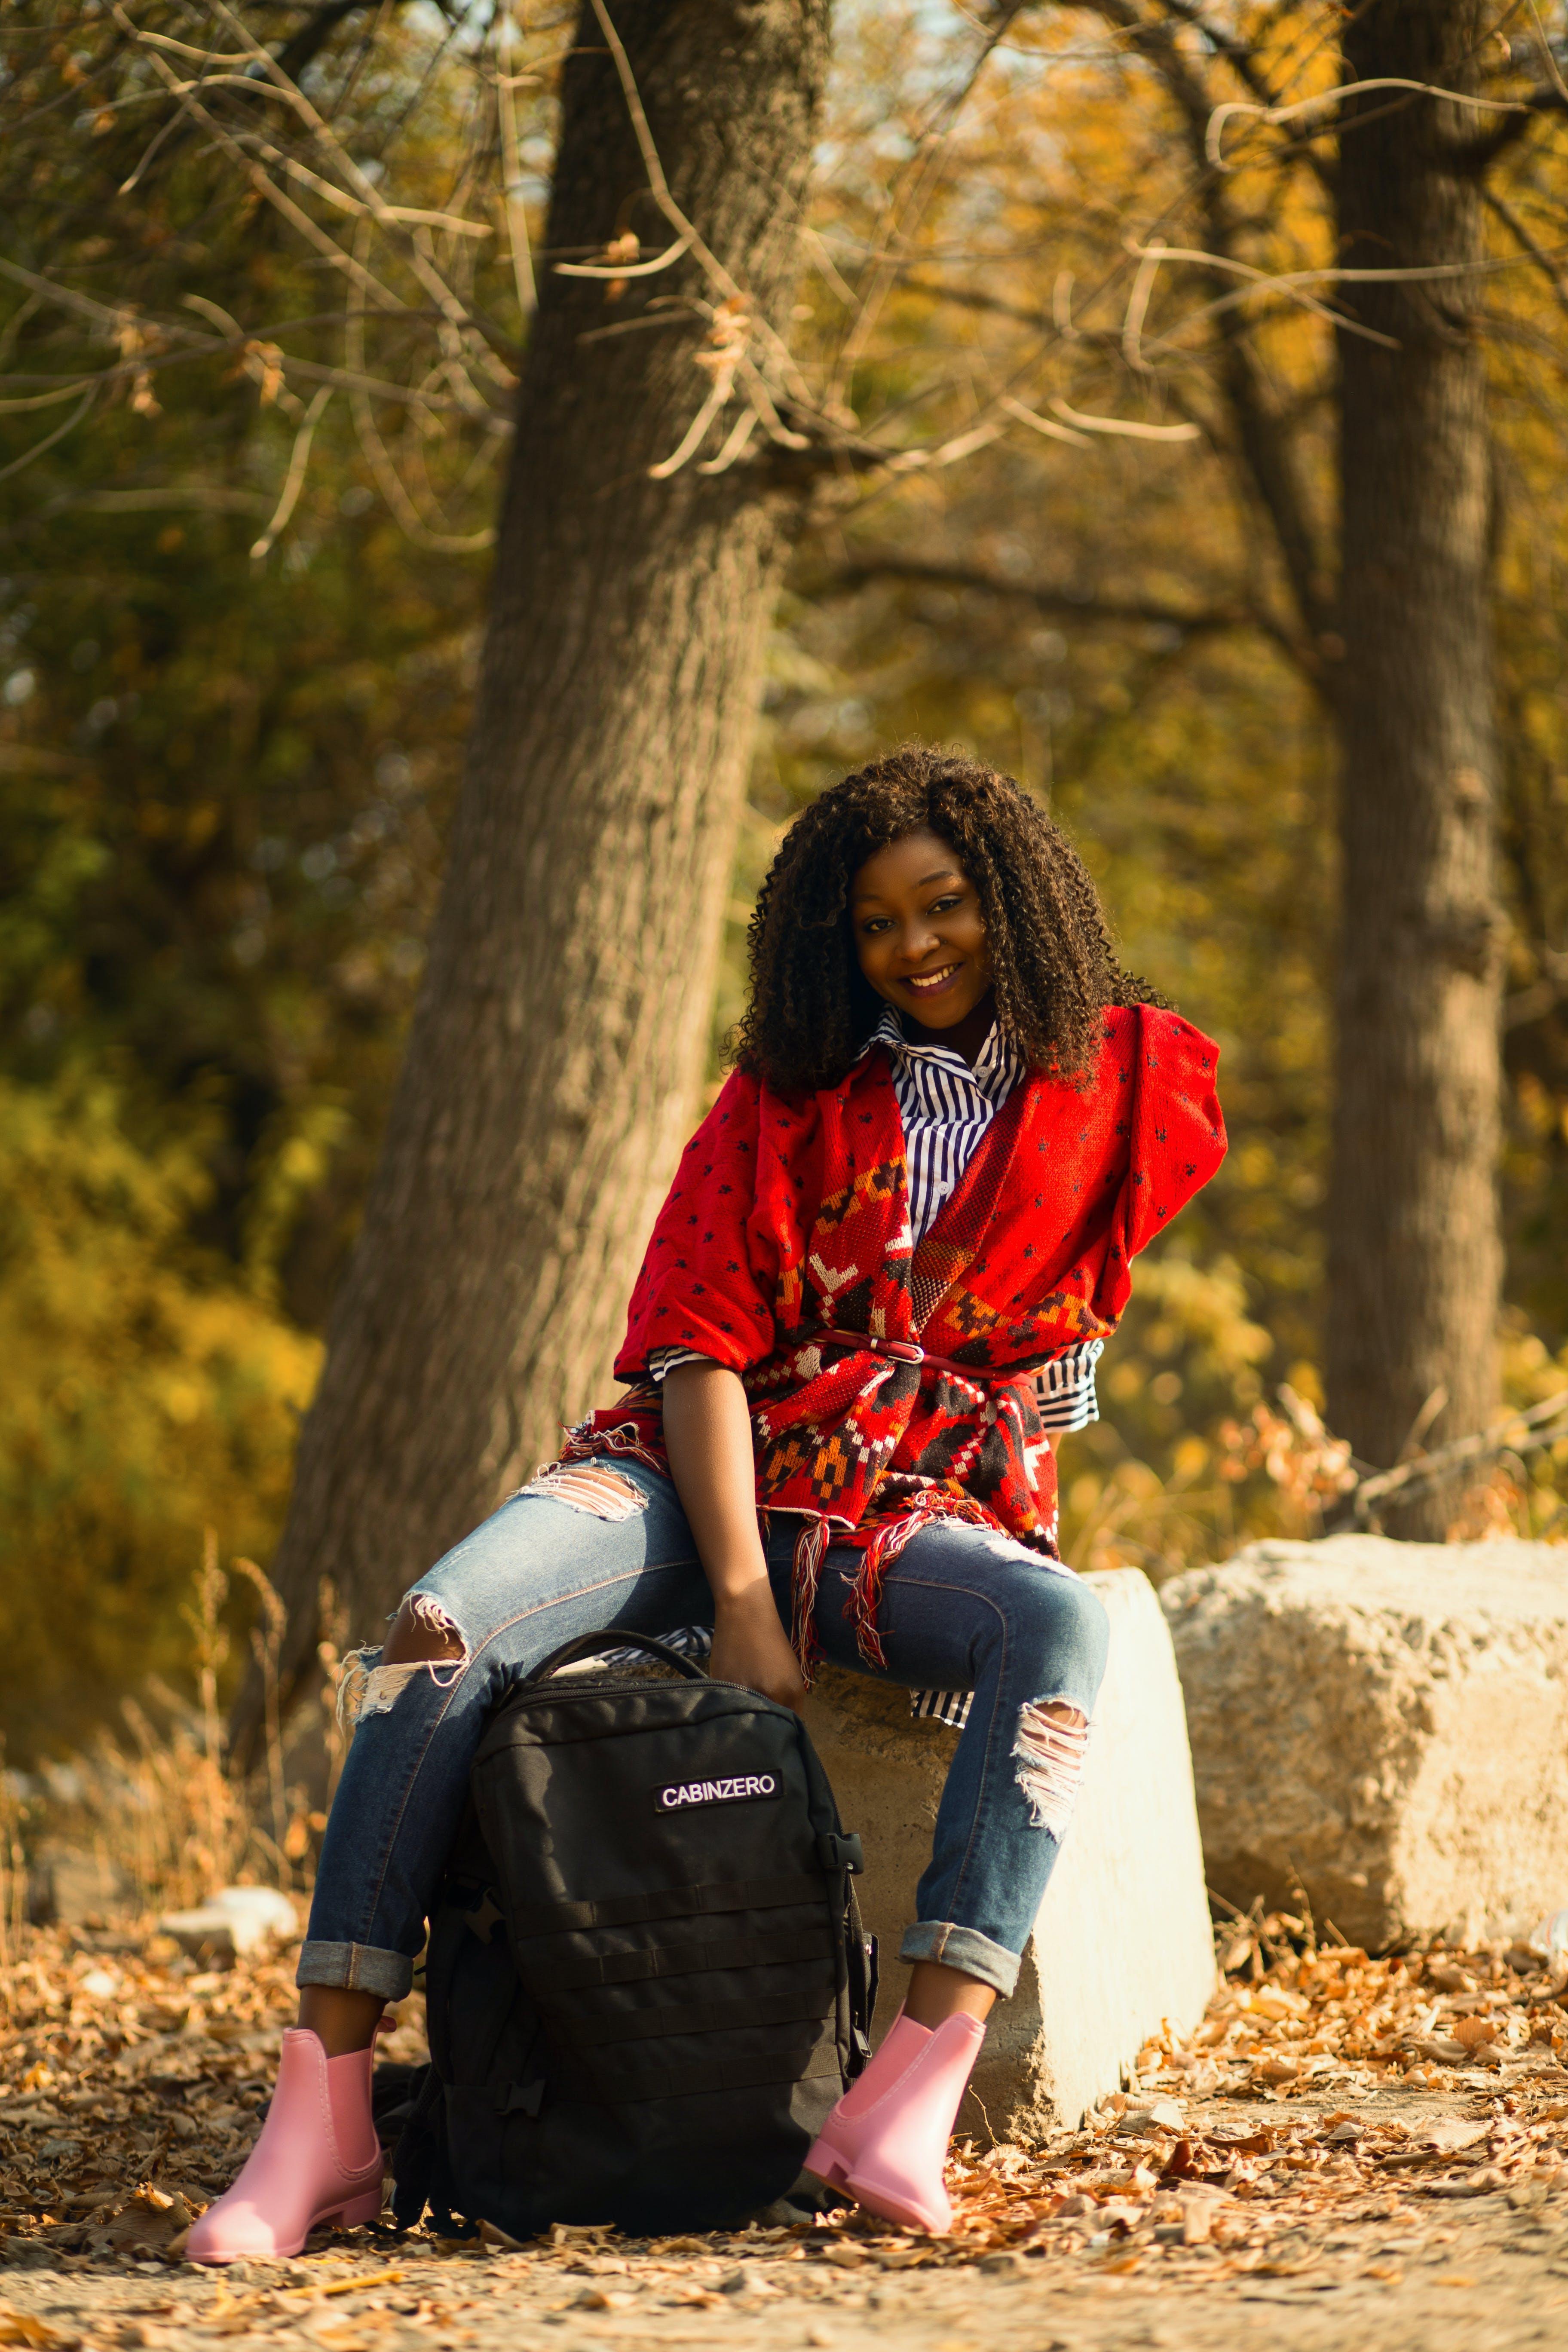 Kostenloses Stock Foto zu afroamerikaner-frau, bäume, draußen, farbige frau